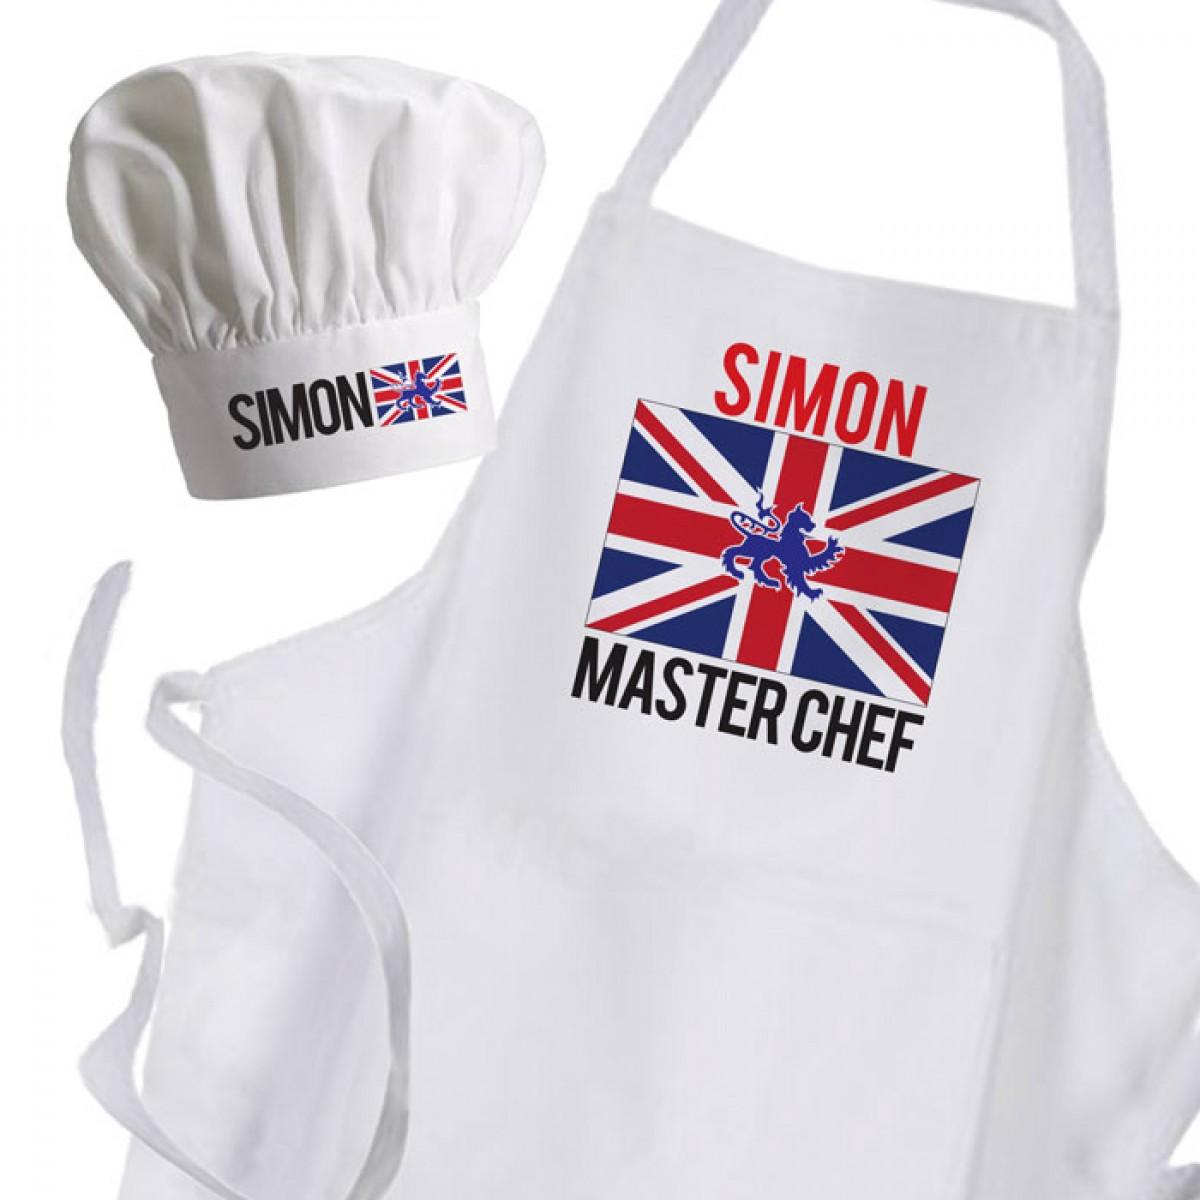 White apron and chef hat - White Apron And Chef Hat 8